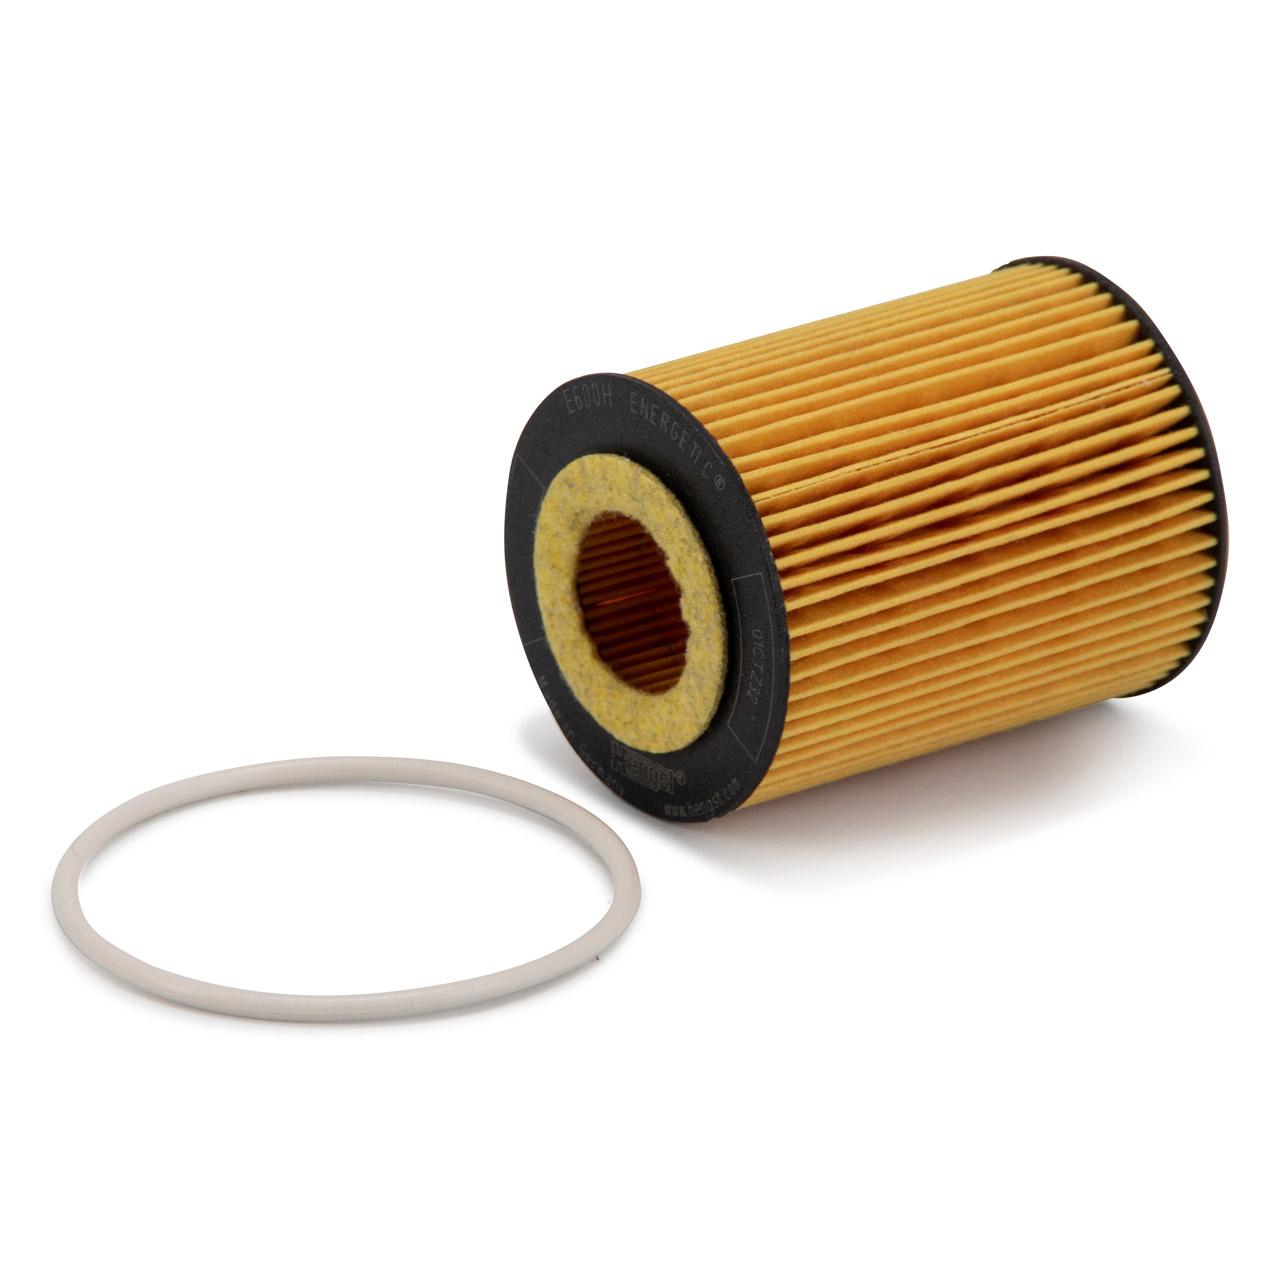 Filterpaket Filterset für Opel Corsa B 1.0i 12V X10XE 1.2i 16V X12XE